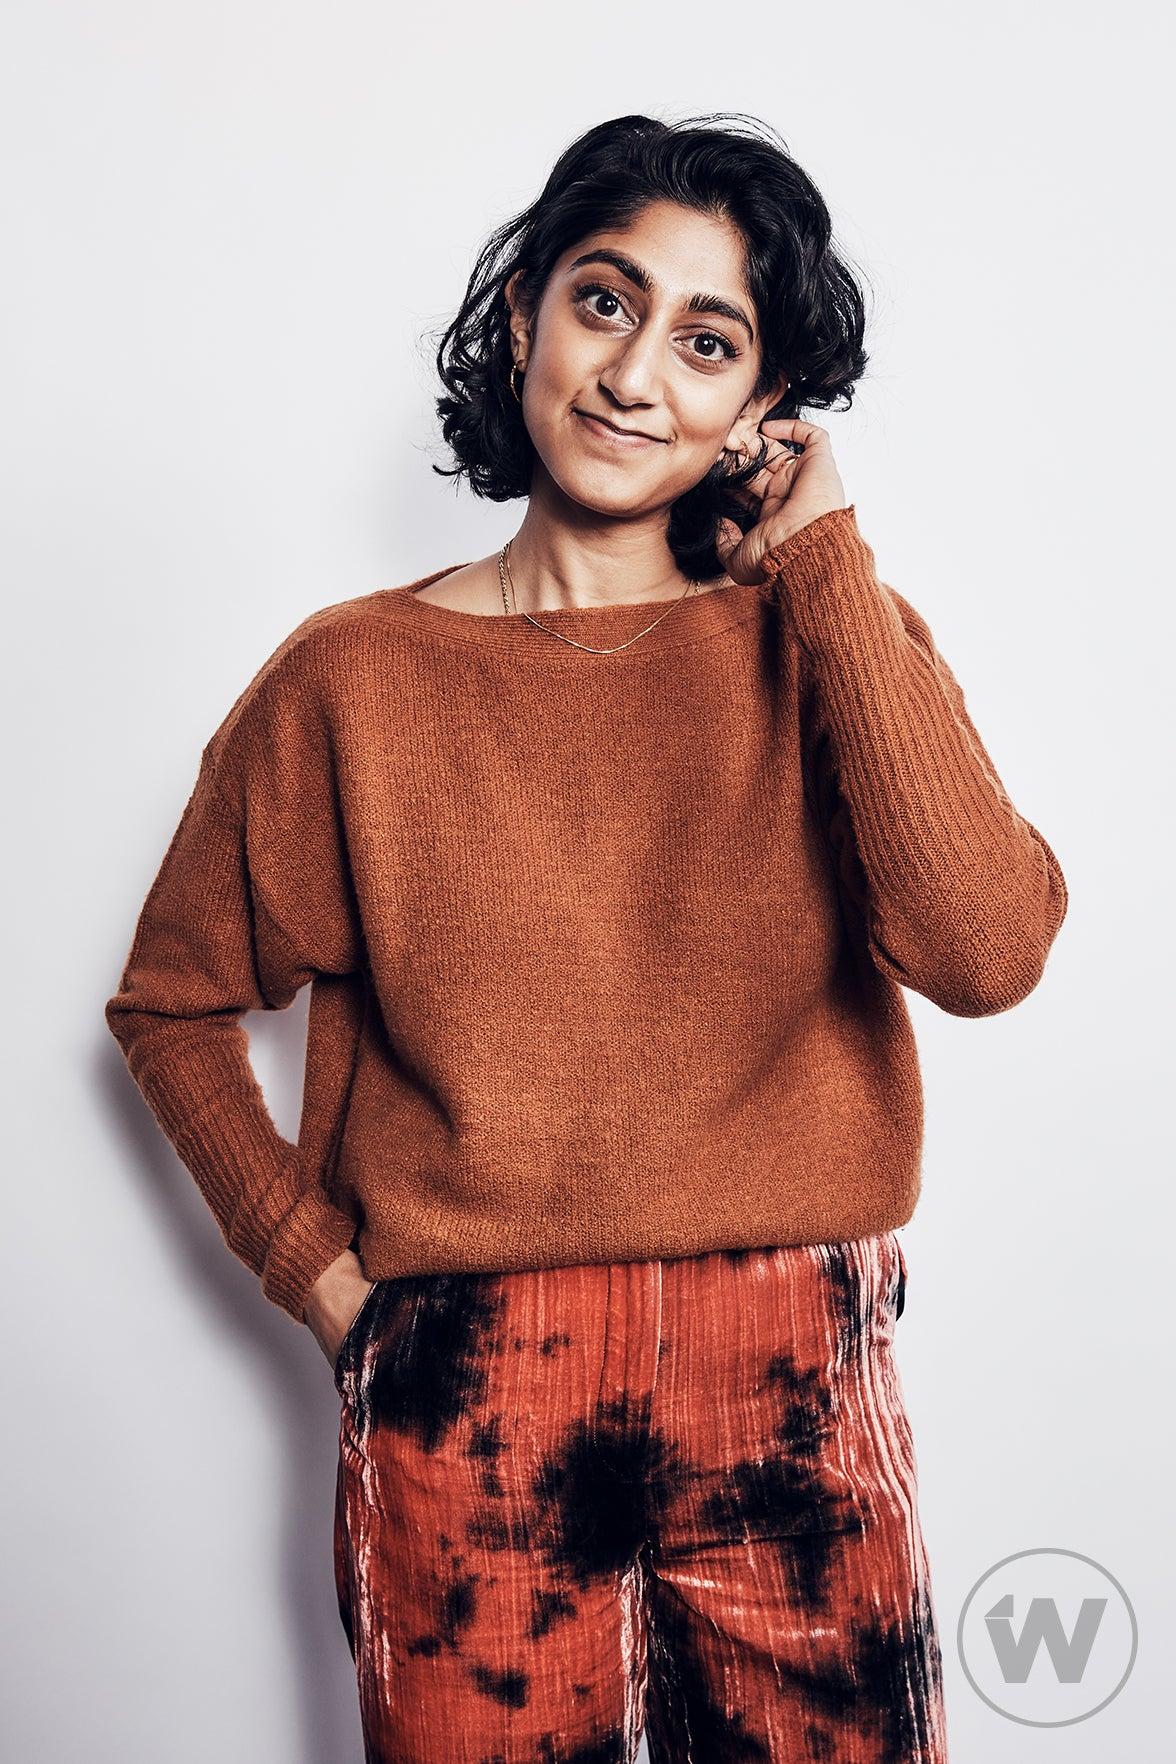 Sunita Mani, Save Yourselves